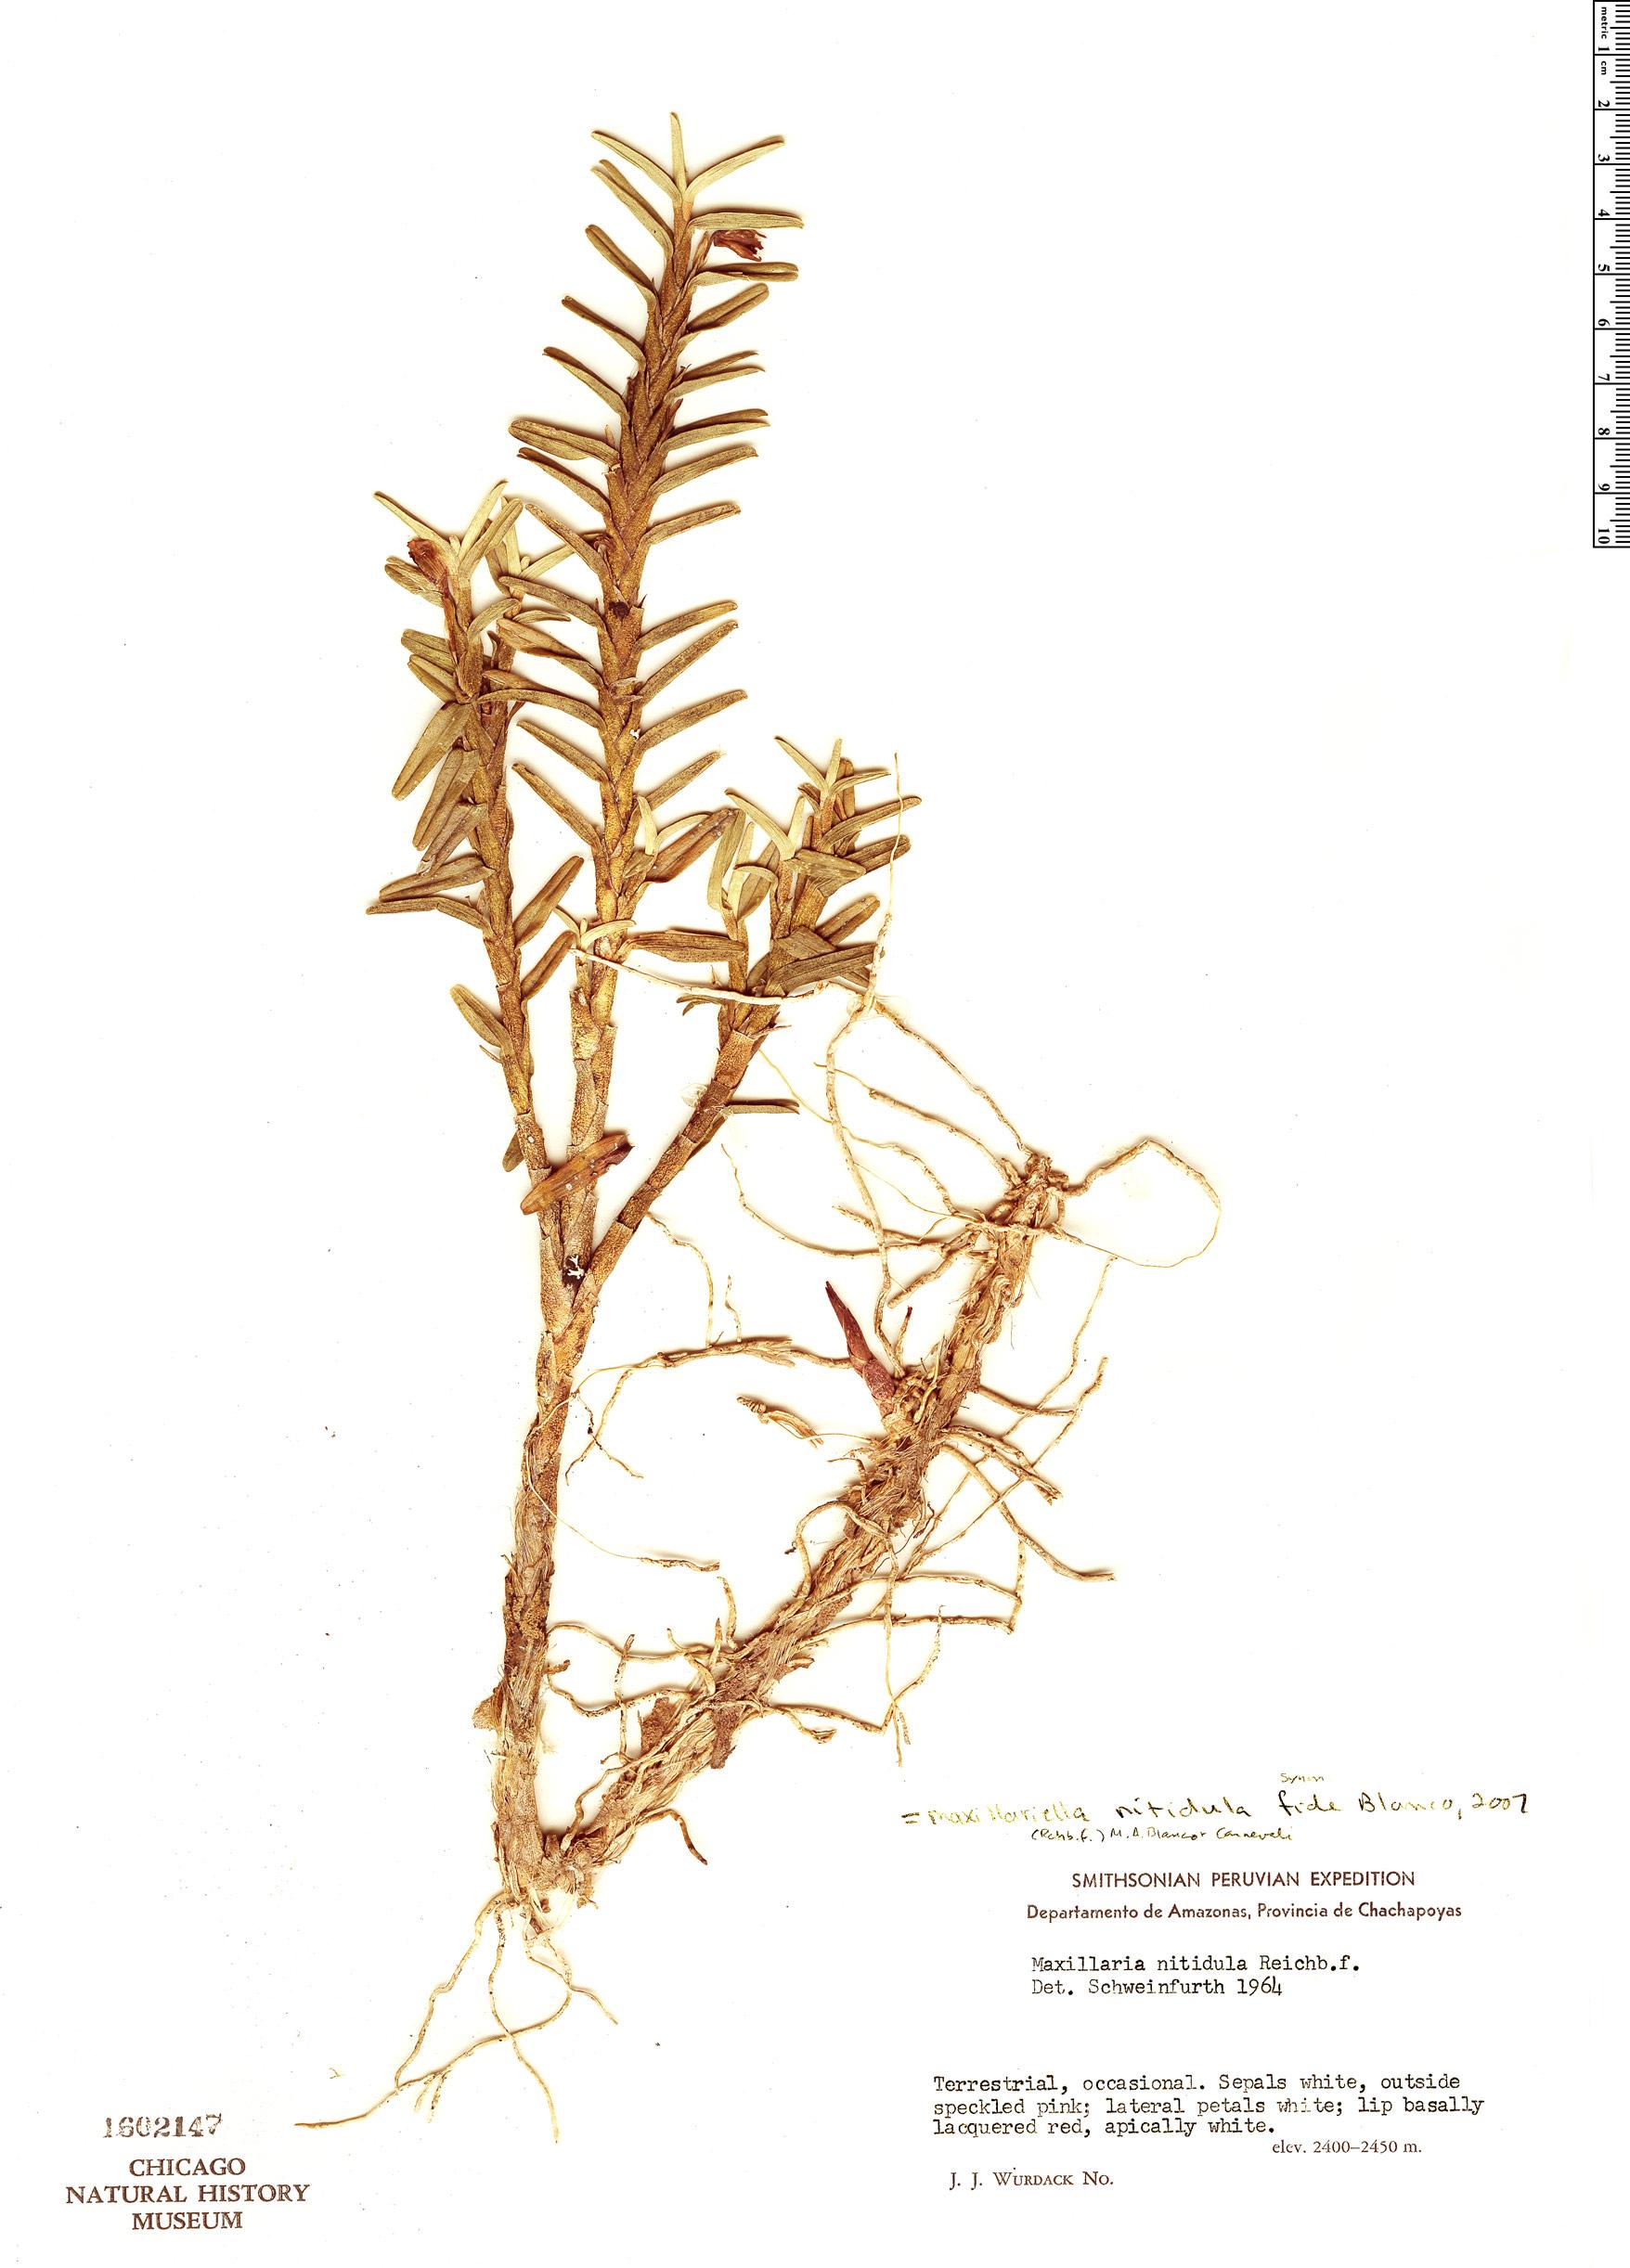 Specimen: Maxillaria nitidula